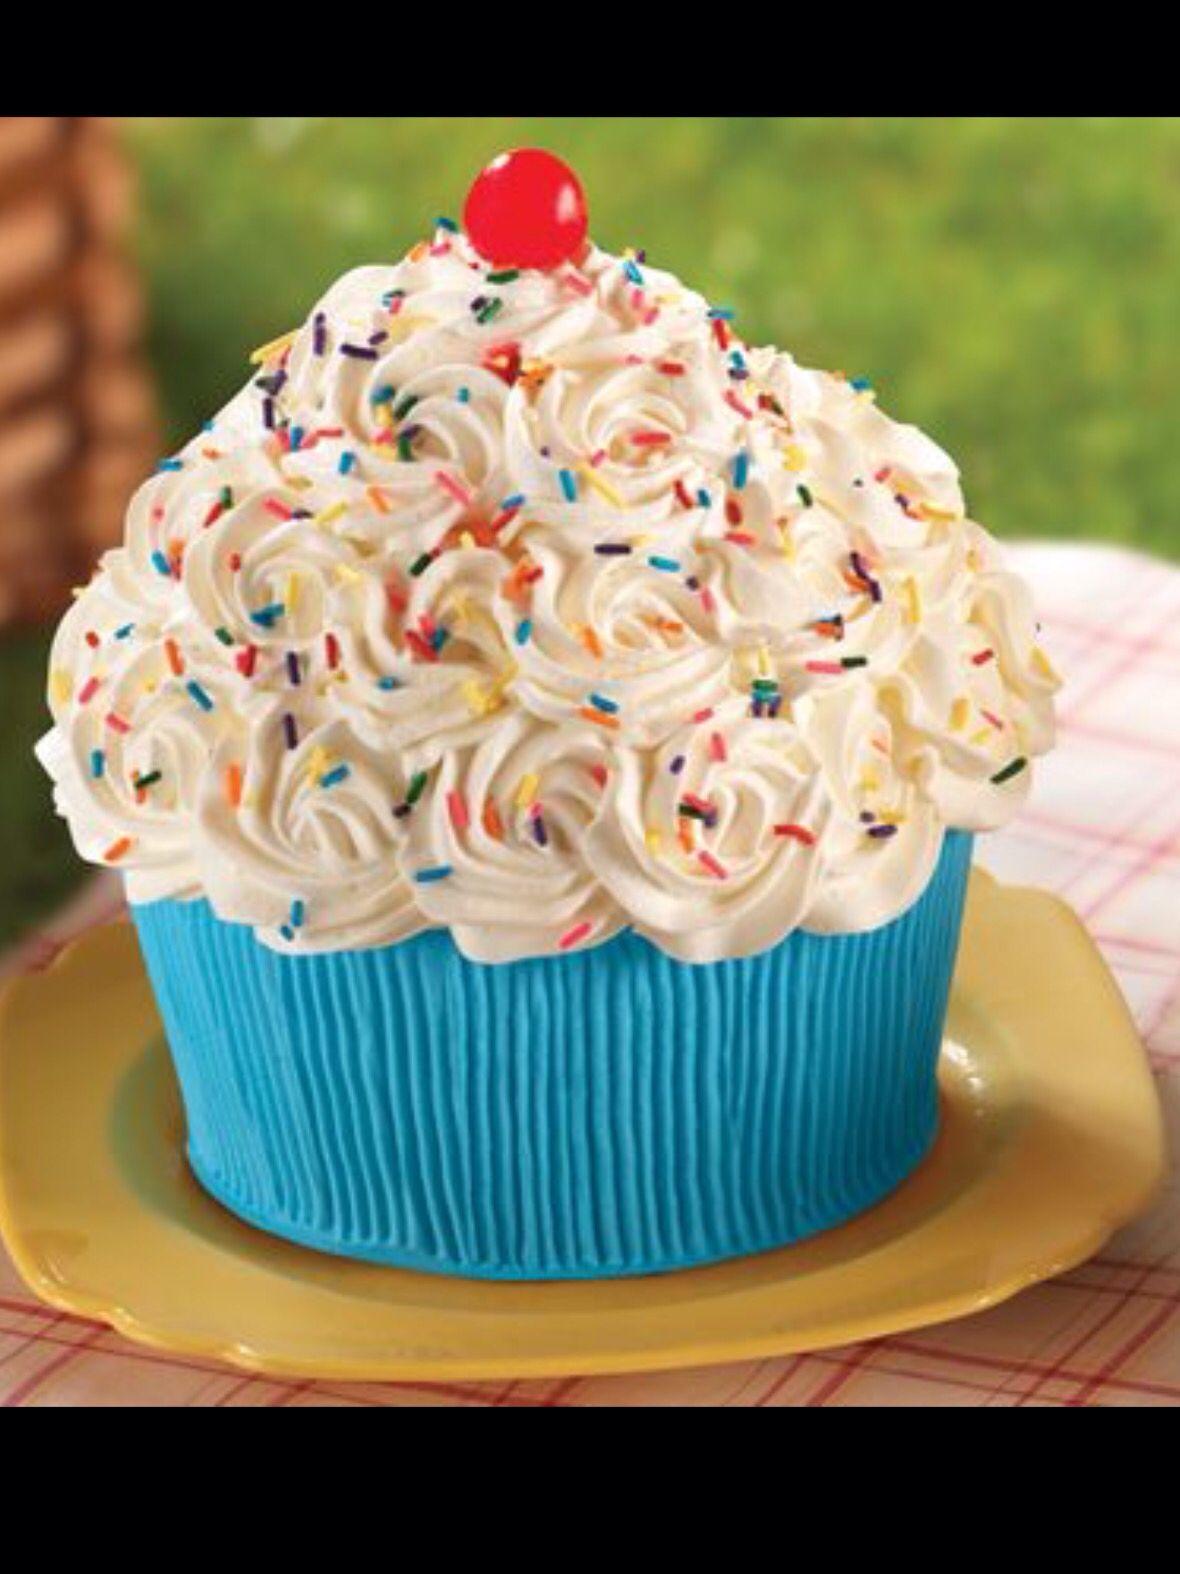 Giant Cupcake Awesomeness